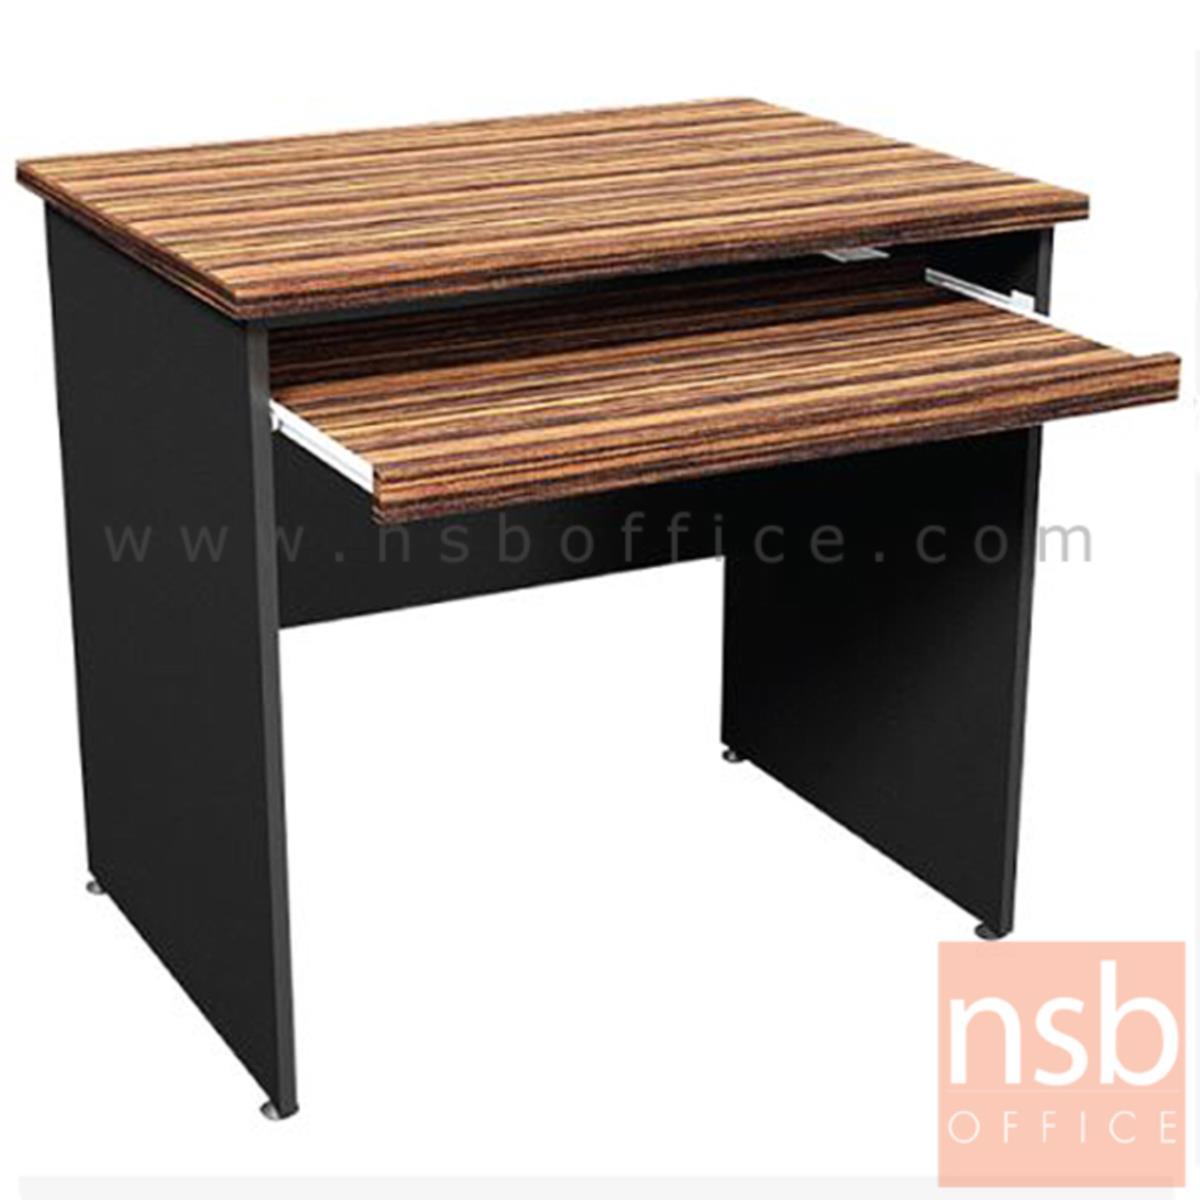 A26A017:โต๊ะคอมพิวเตอร์  รุ่น Escada (เอสคาด้า) ขนาด 80W cm.  ขาไม้ สีลายไม้ซีบราโน่ตัดดำ ขอบ ROSEGOLD